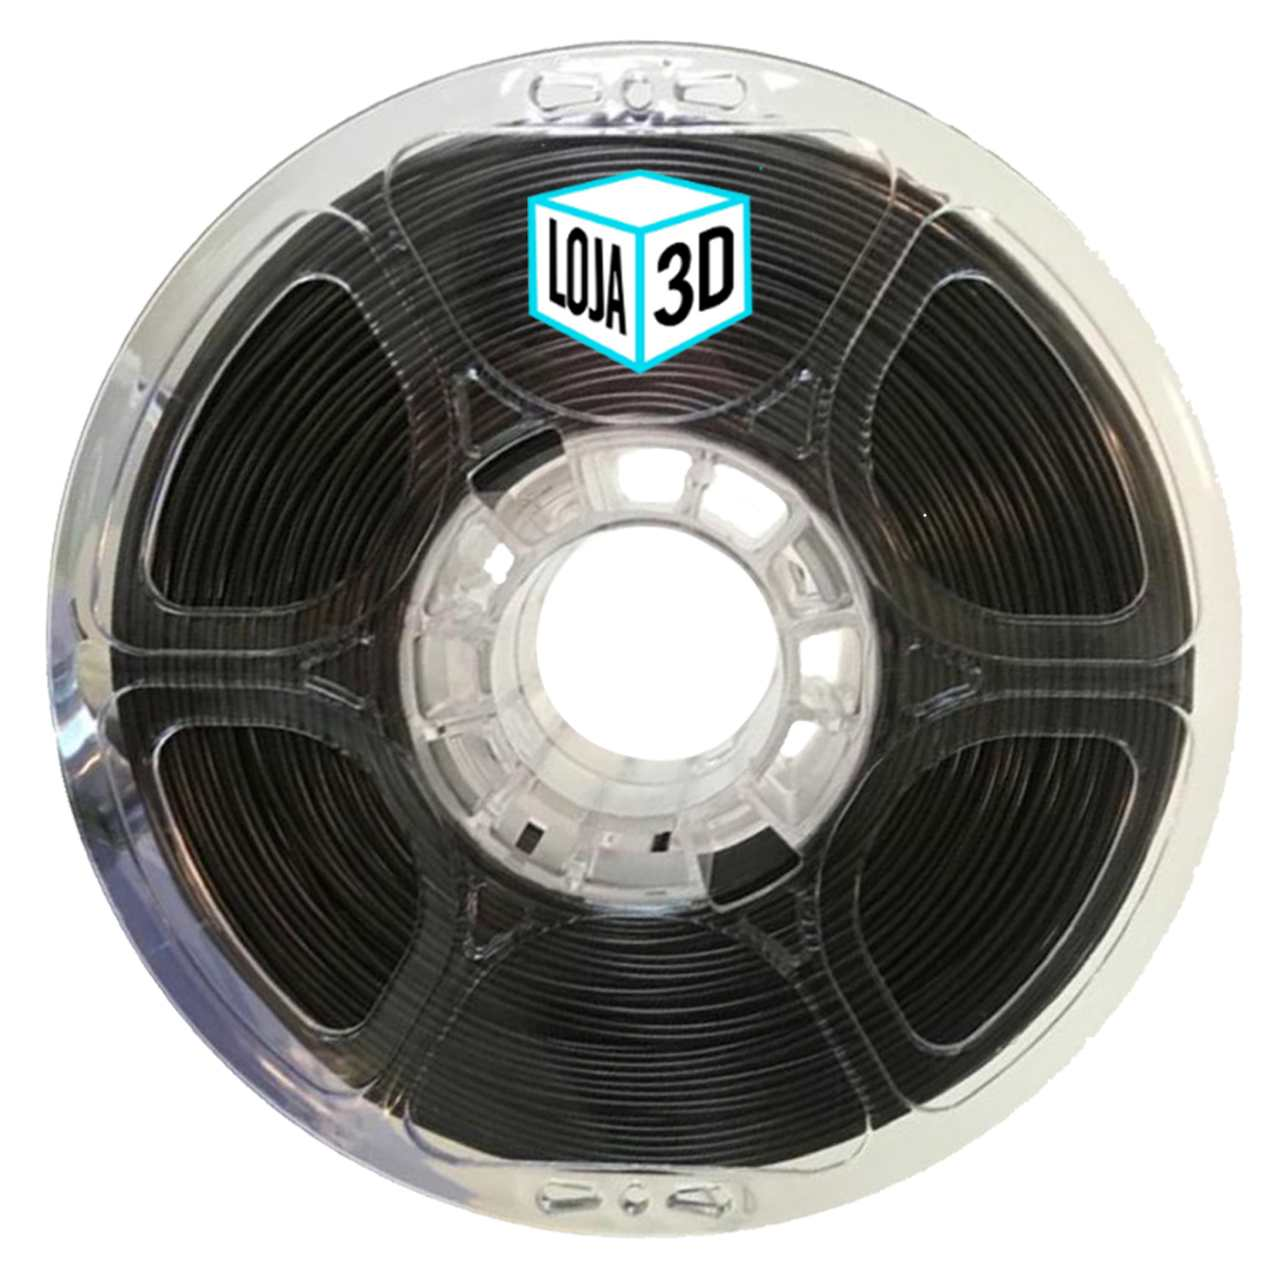 Filamento PET-G Pro - Marrom Escuro - Loja 3D - 1.75mm - 1kg